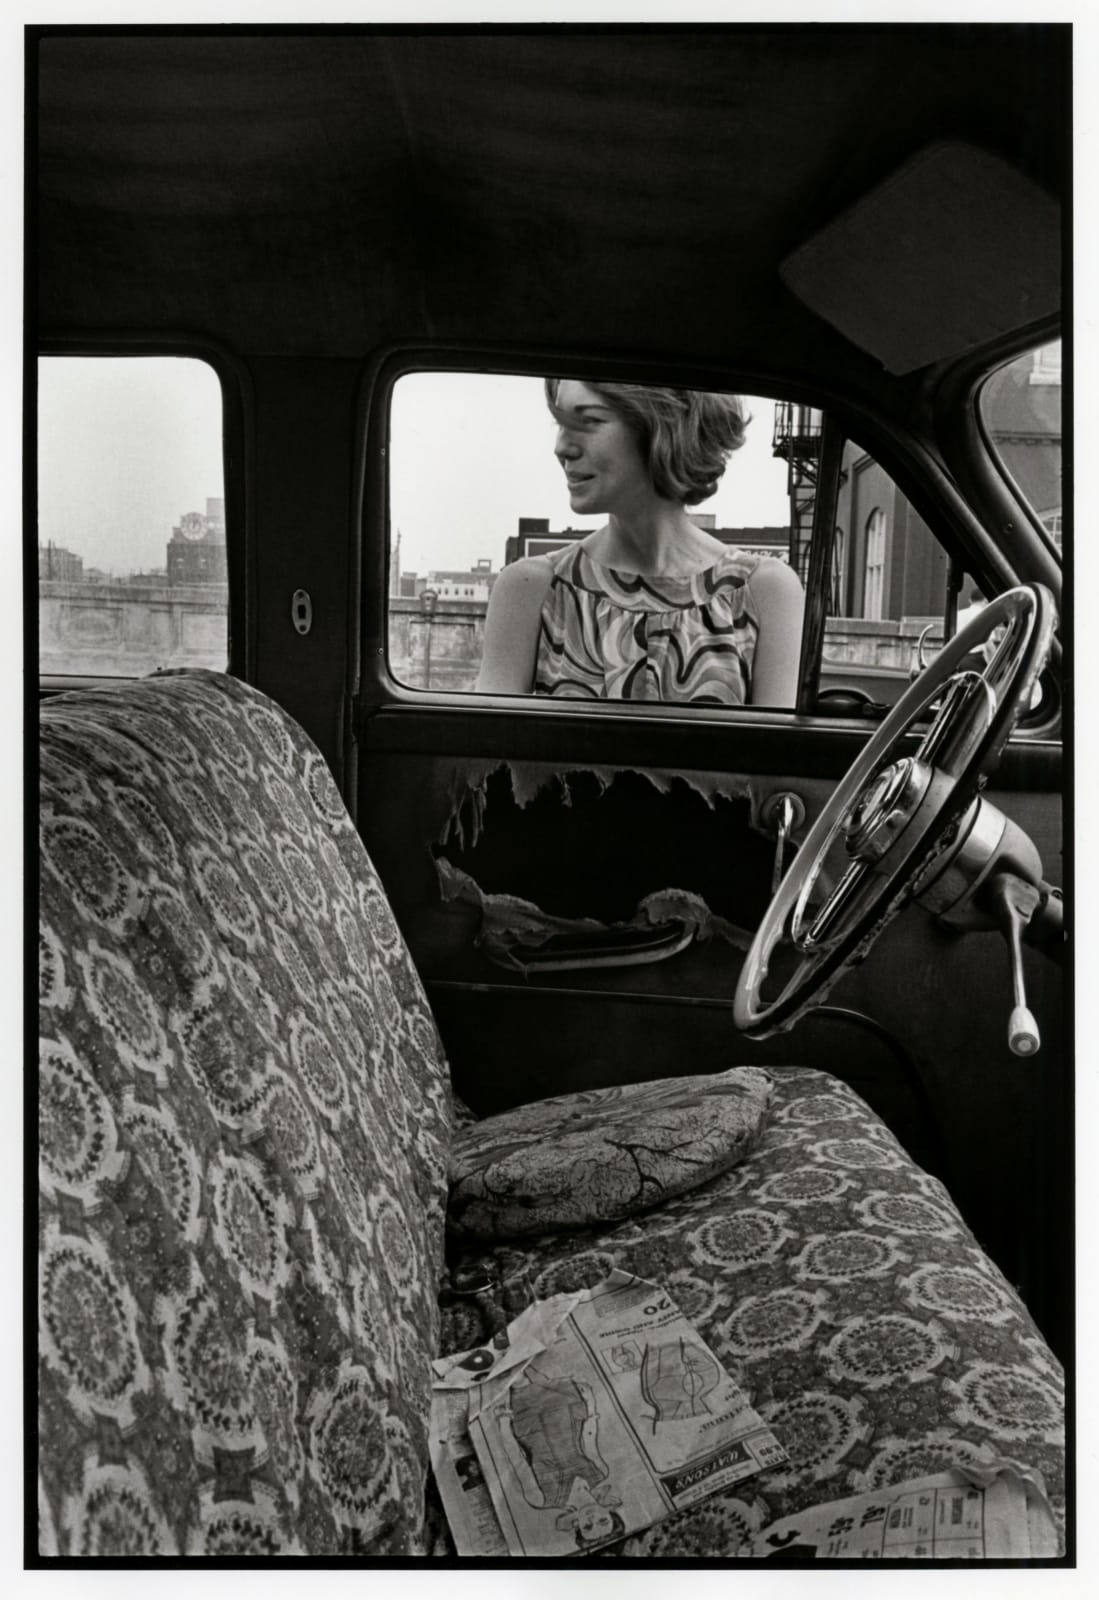 Danny Lyon - Leslie, Knoxville, 1967